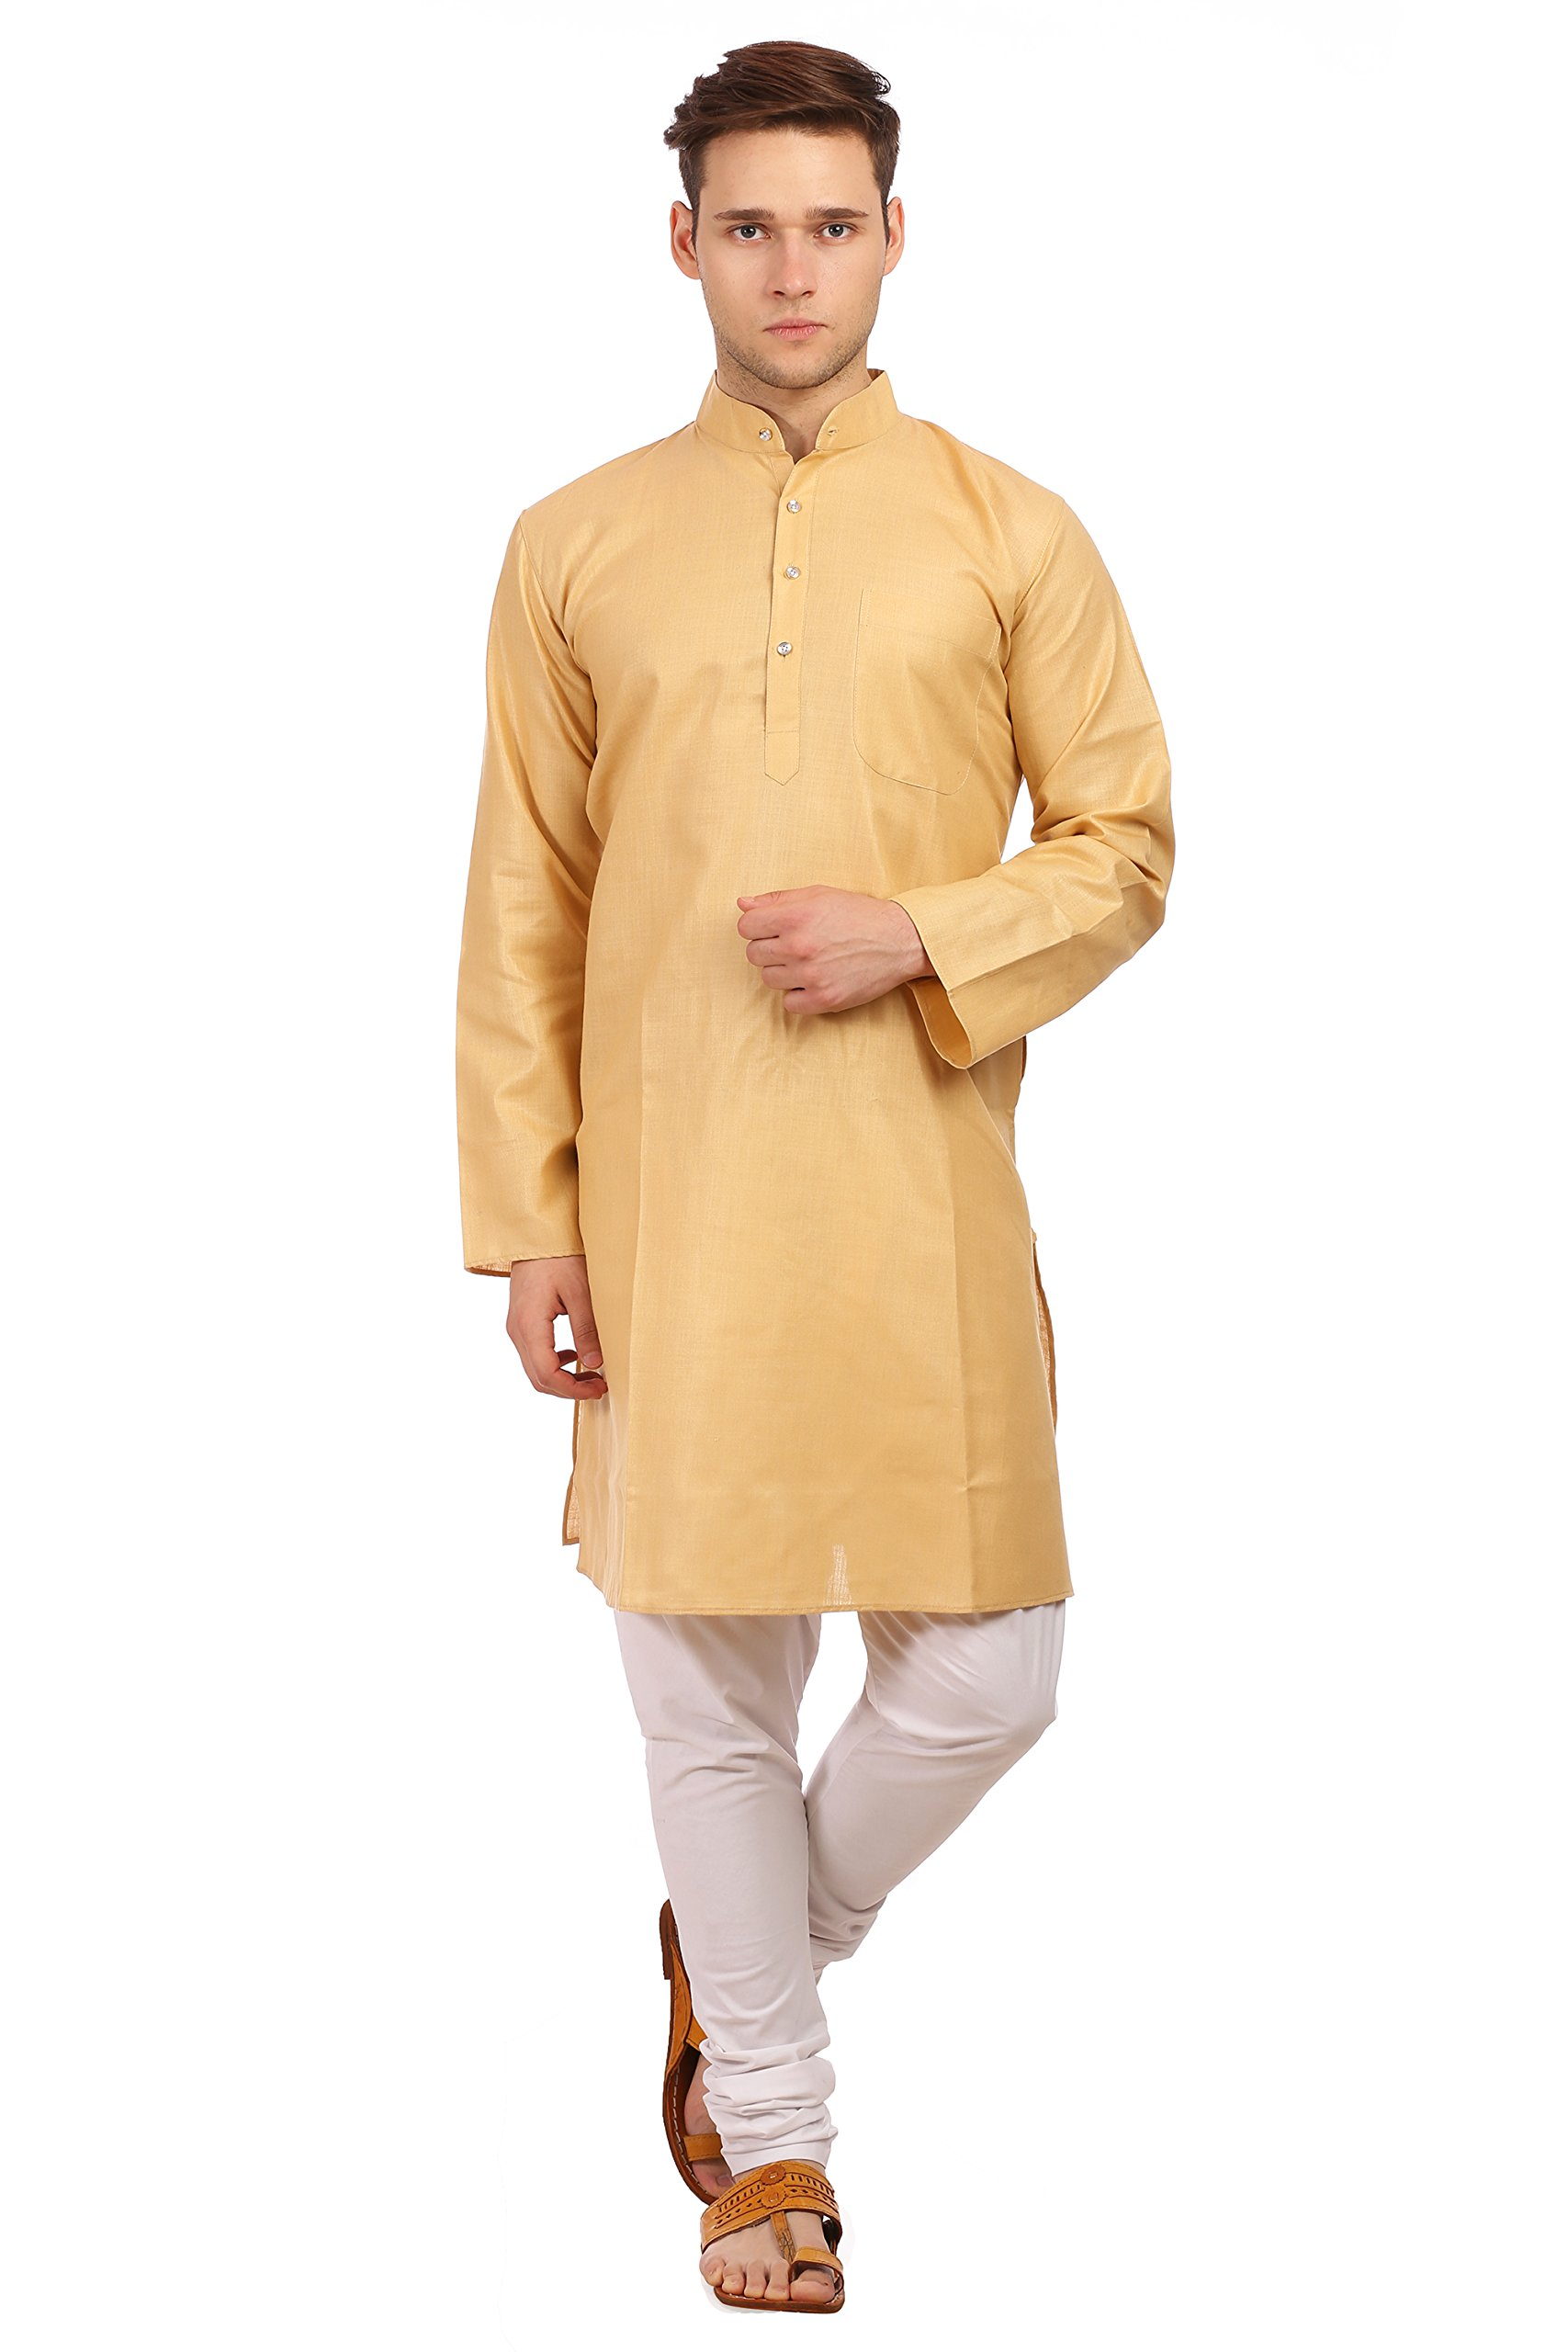 WINTAGE Men's Cotton Silk Festive and Casual Beige Kurta Pyjama